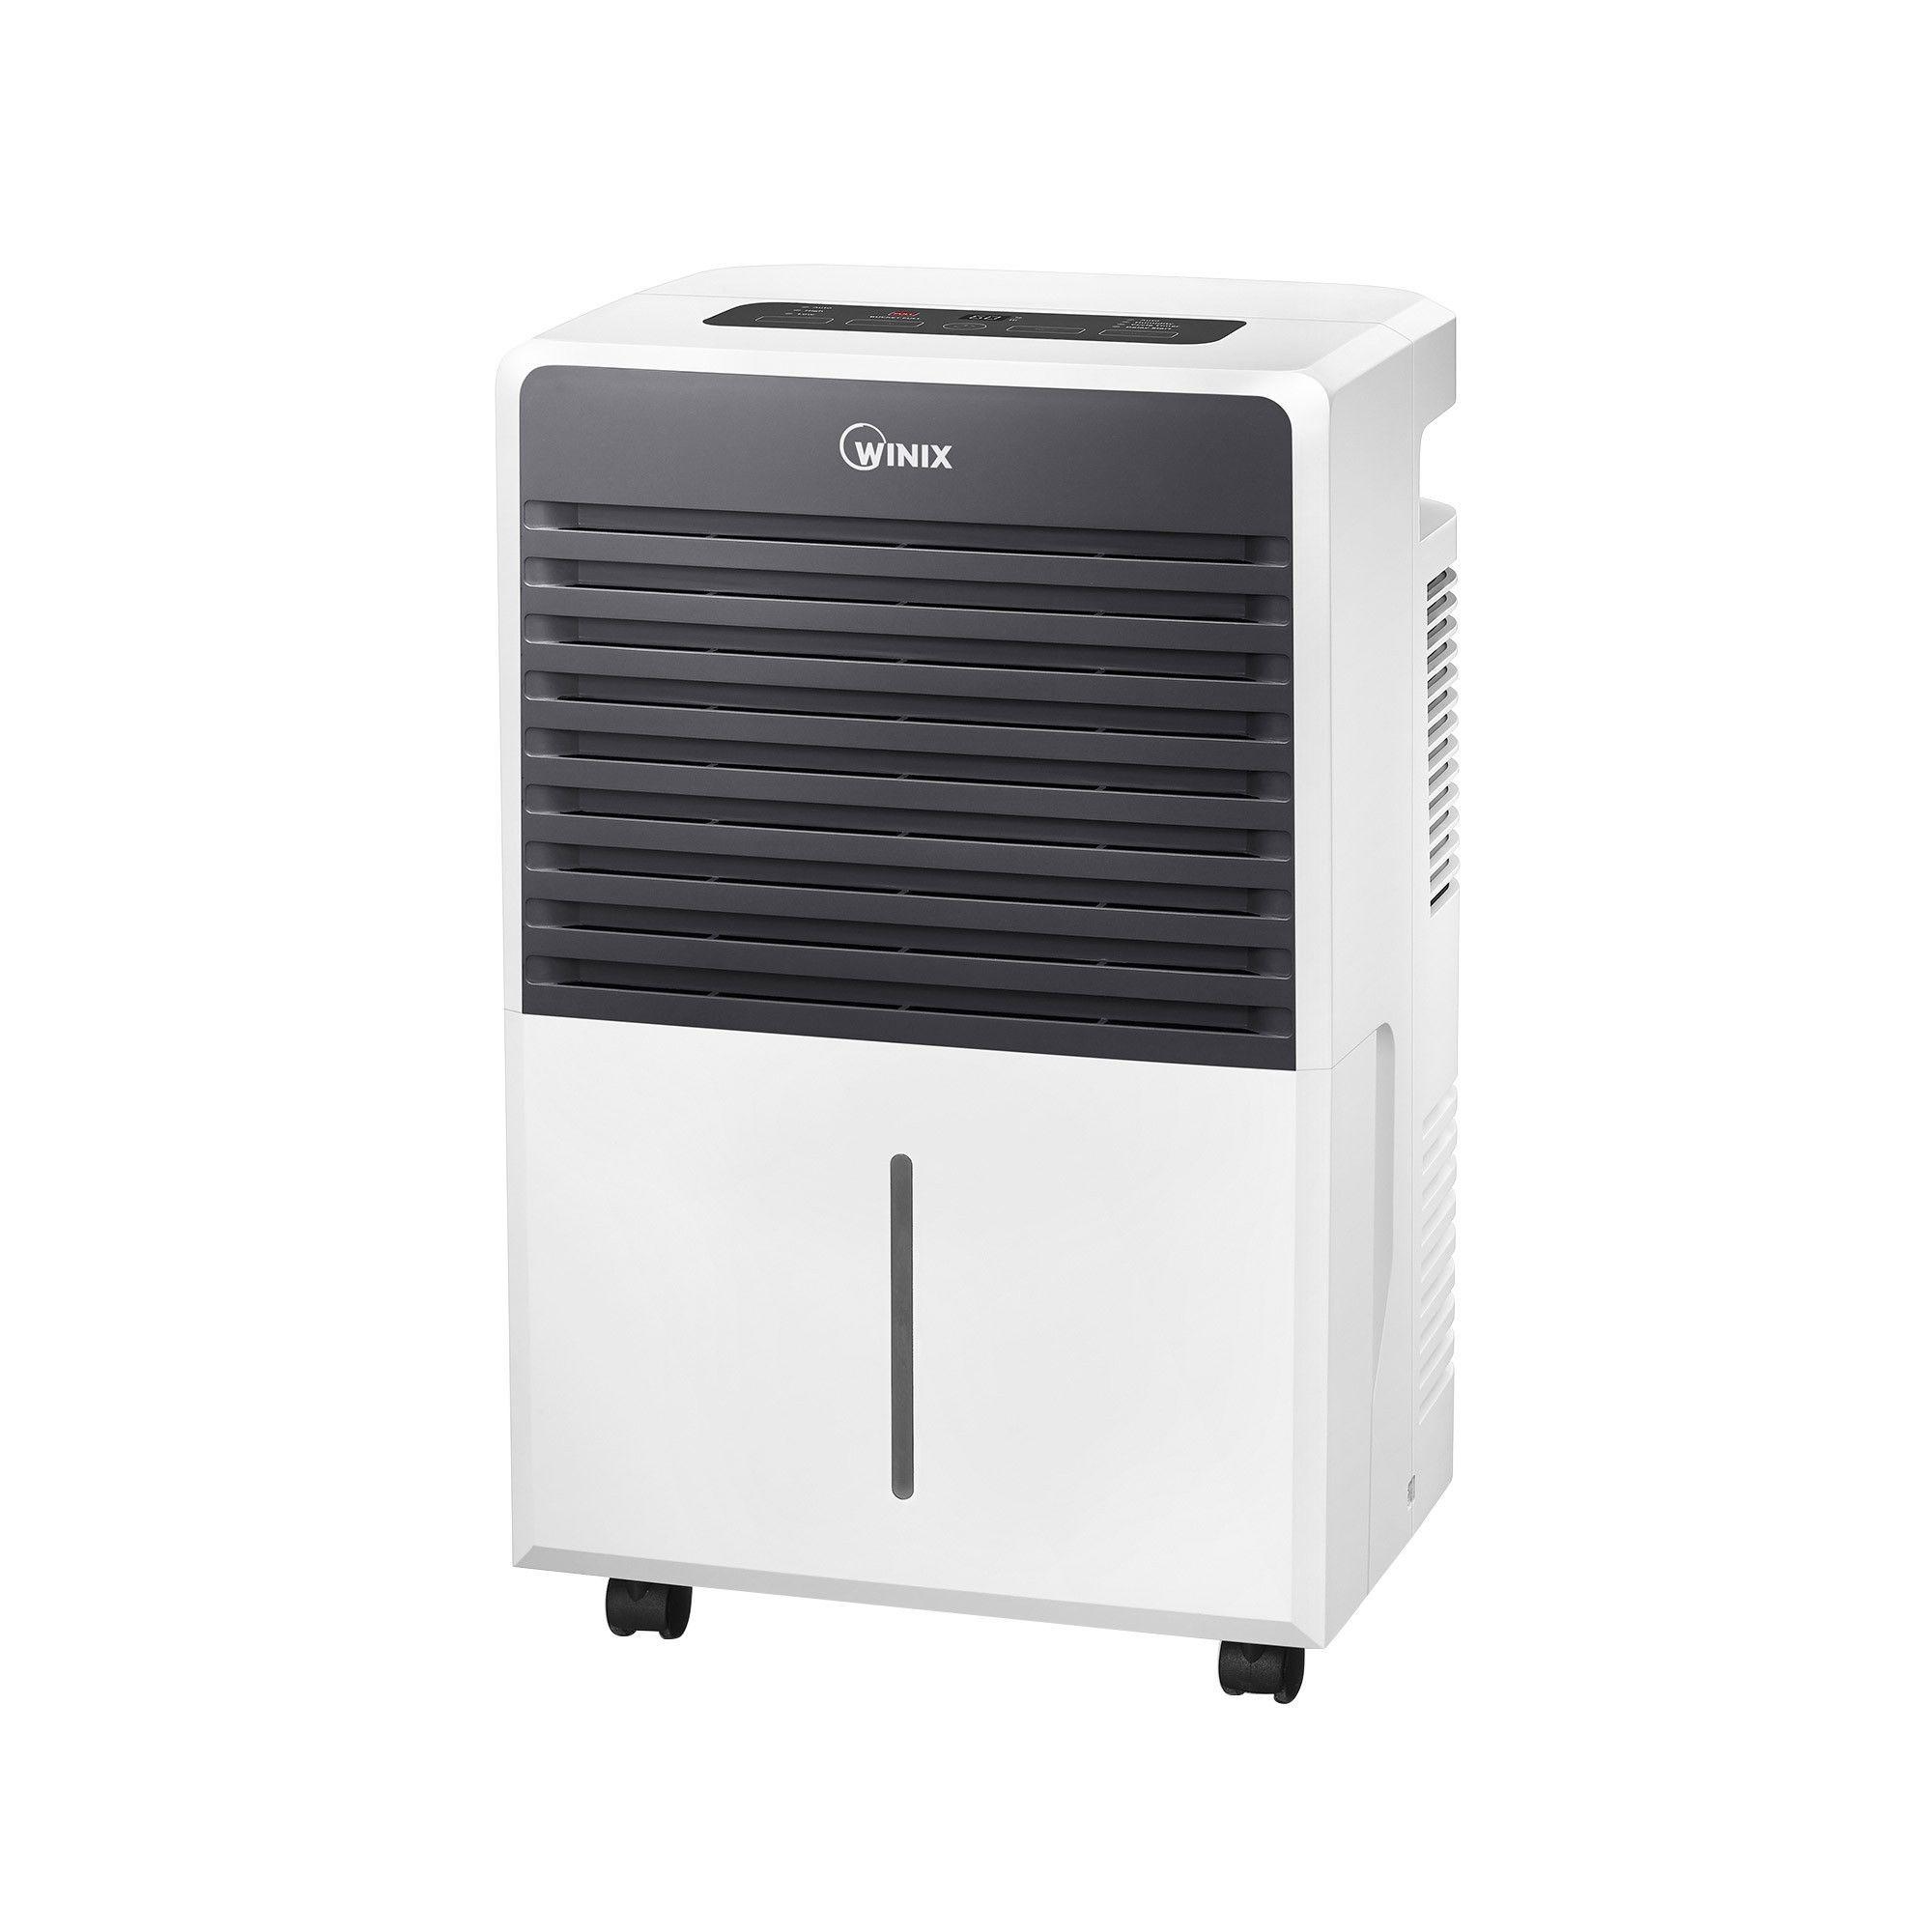 Winix 50pint Dehumidifier Dehumidifiers, Microfiber